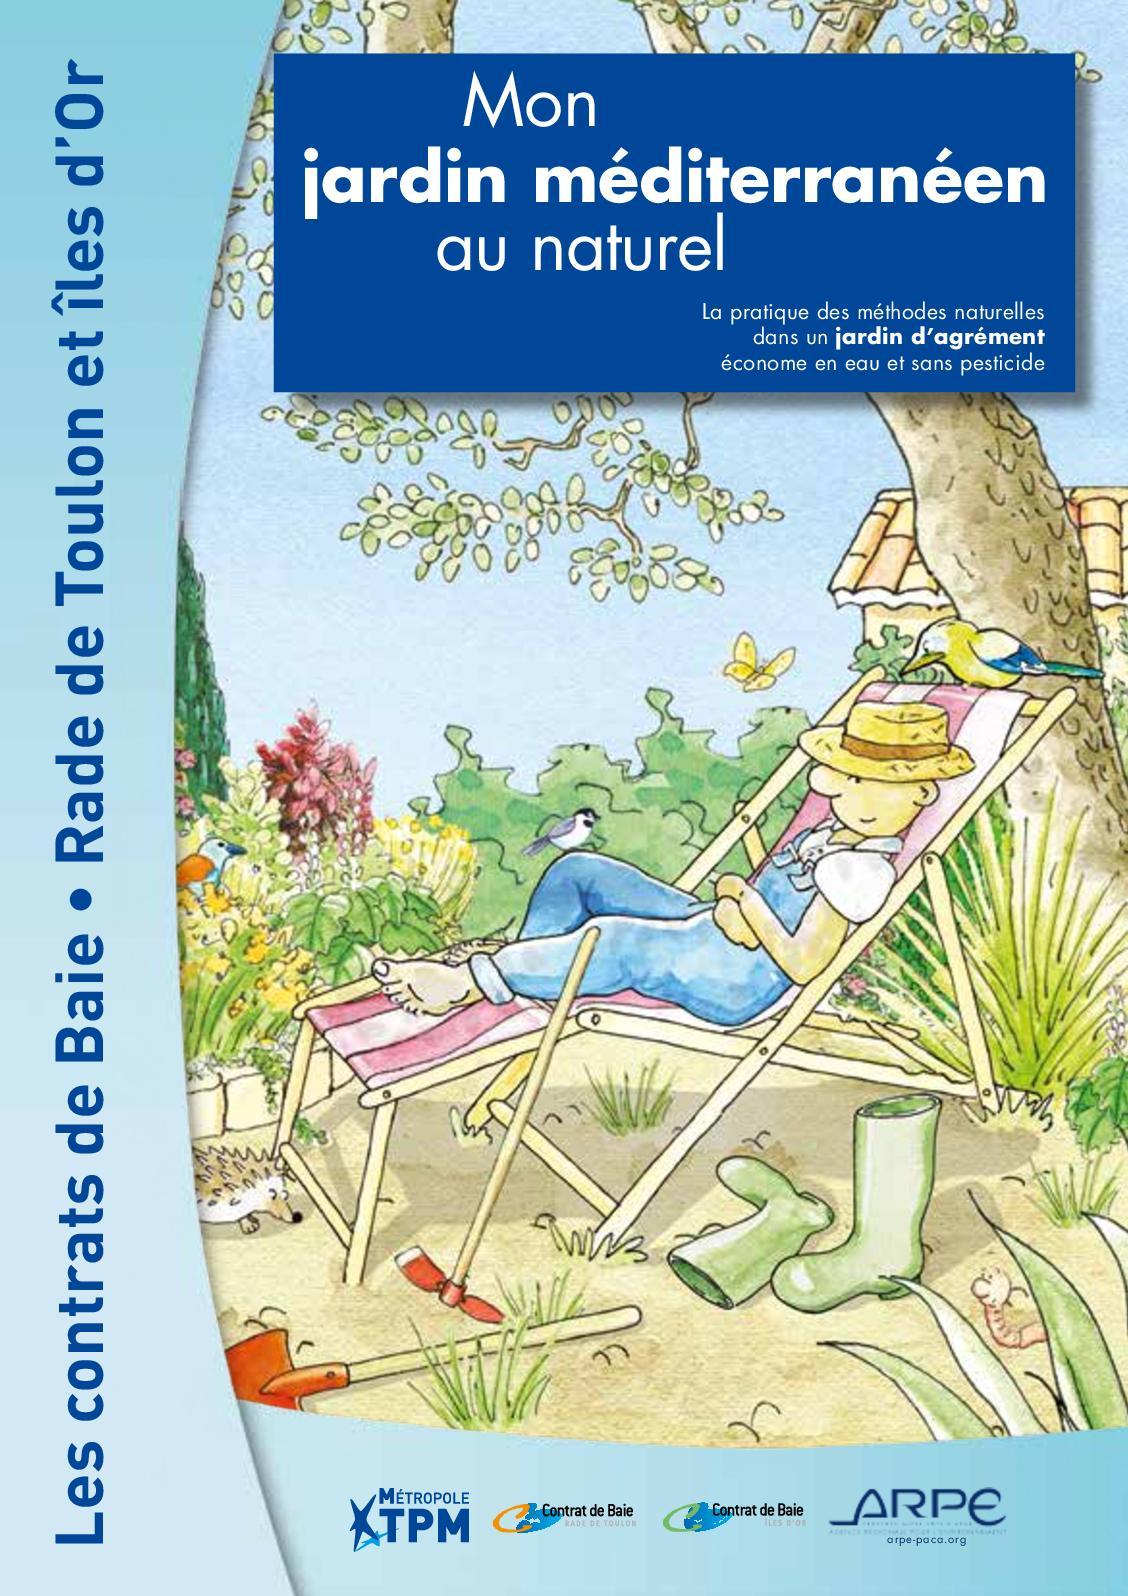 Plante Méditerranéenne Sans Arrosage calaméo - mon jardin méditerranéen au naturel 2018